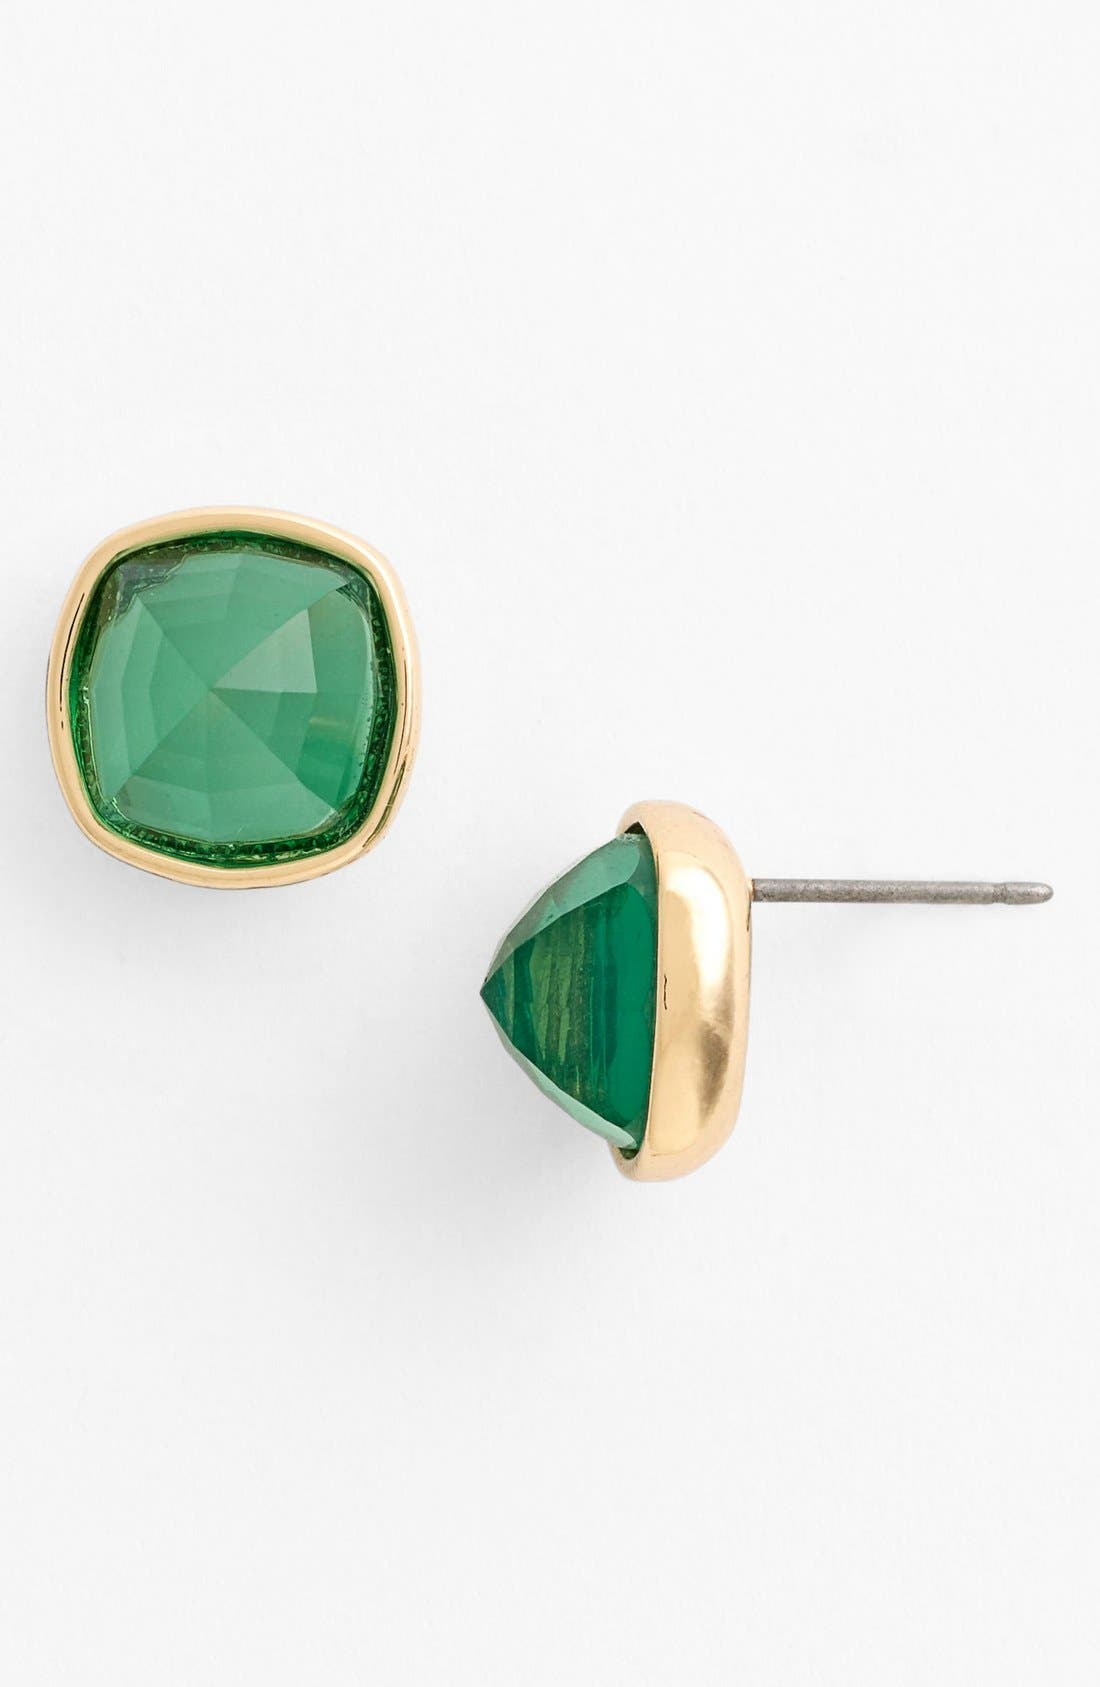 Alternate Image 1 Selected - Anne Klein Cushion Cut Stone Stud Earrings